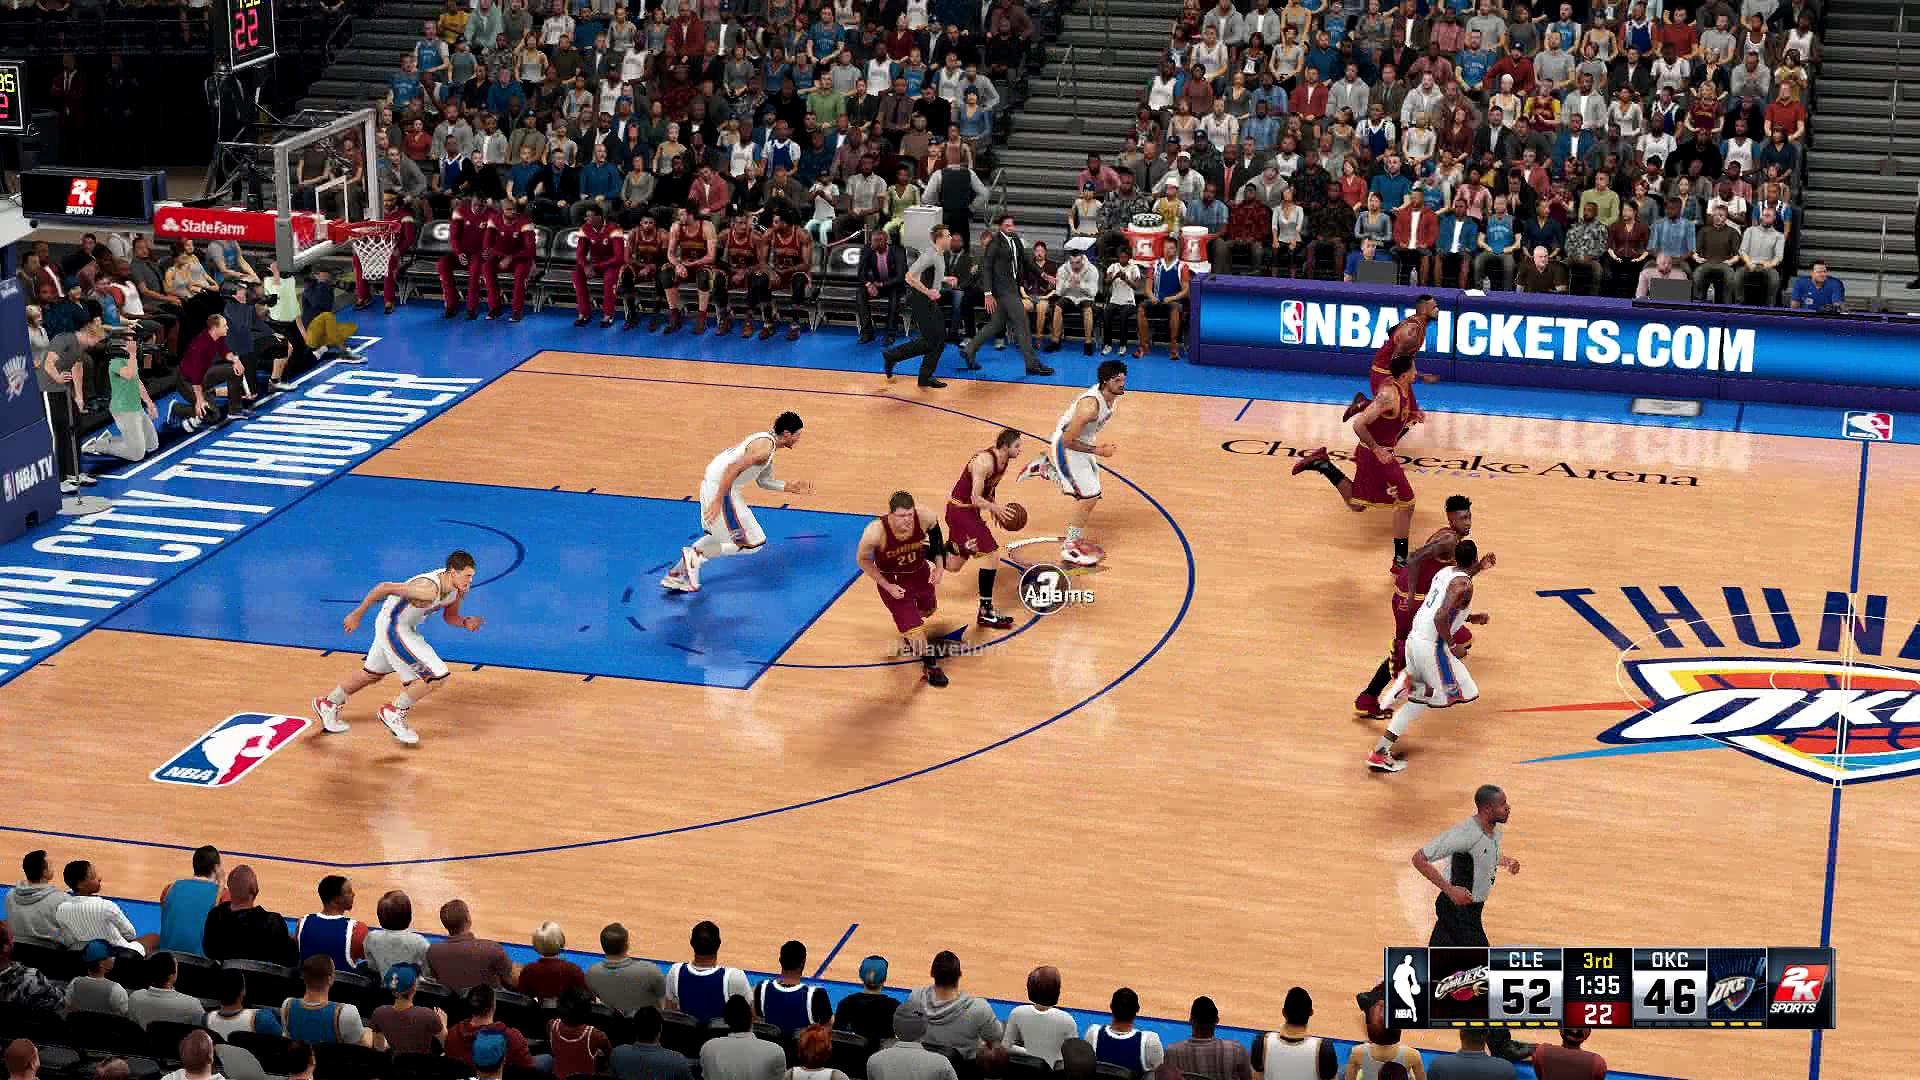 NBA 2K16 – 10,000 SUBSCRIBERS!!! (Shoutout Sunday/ Q-A / FaceCam Reveal News)